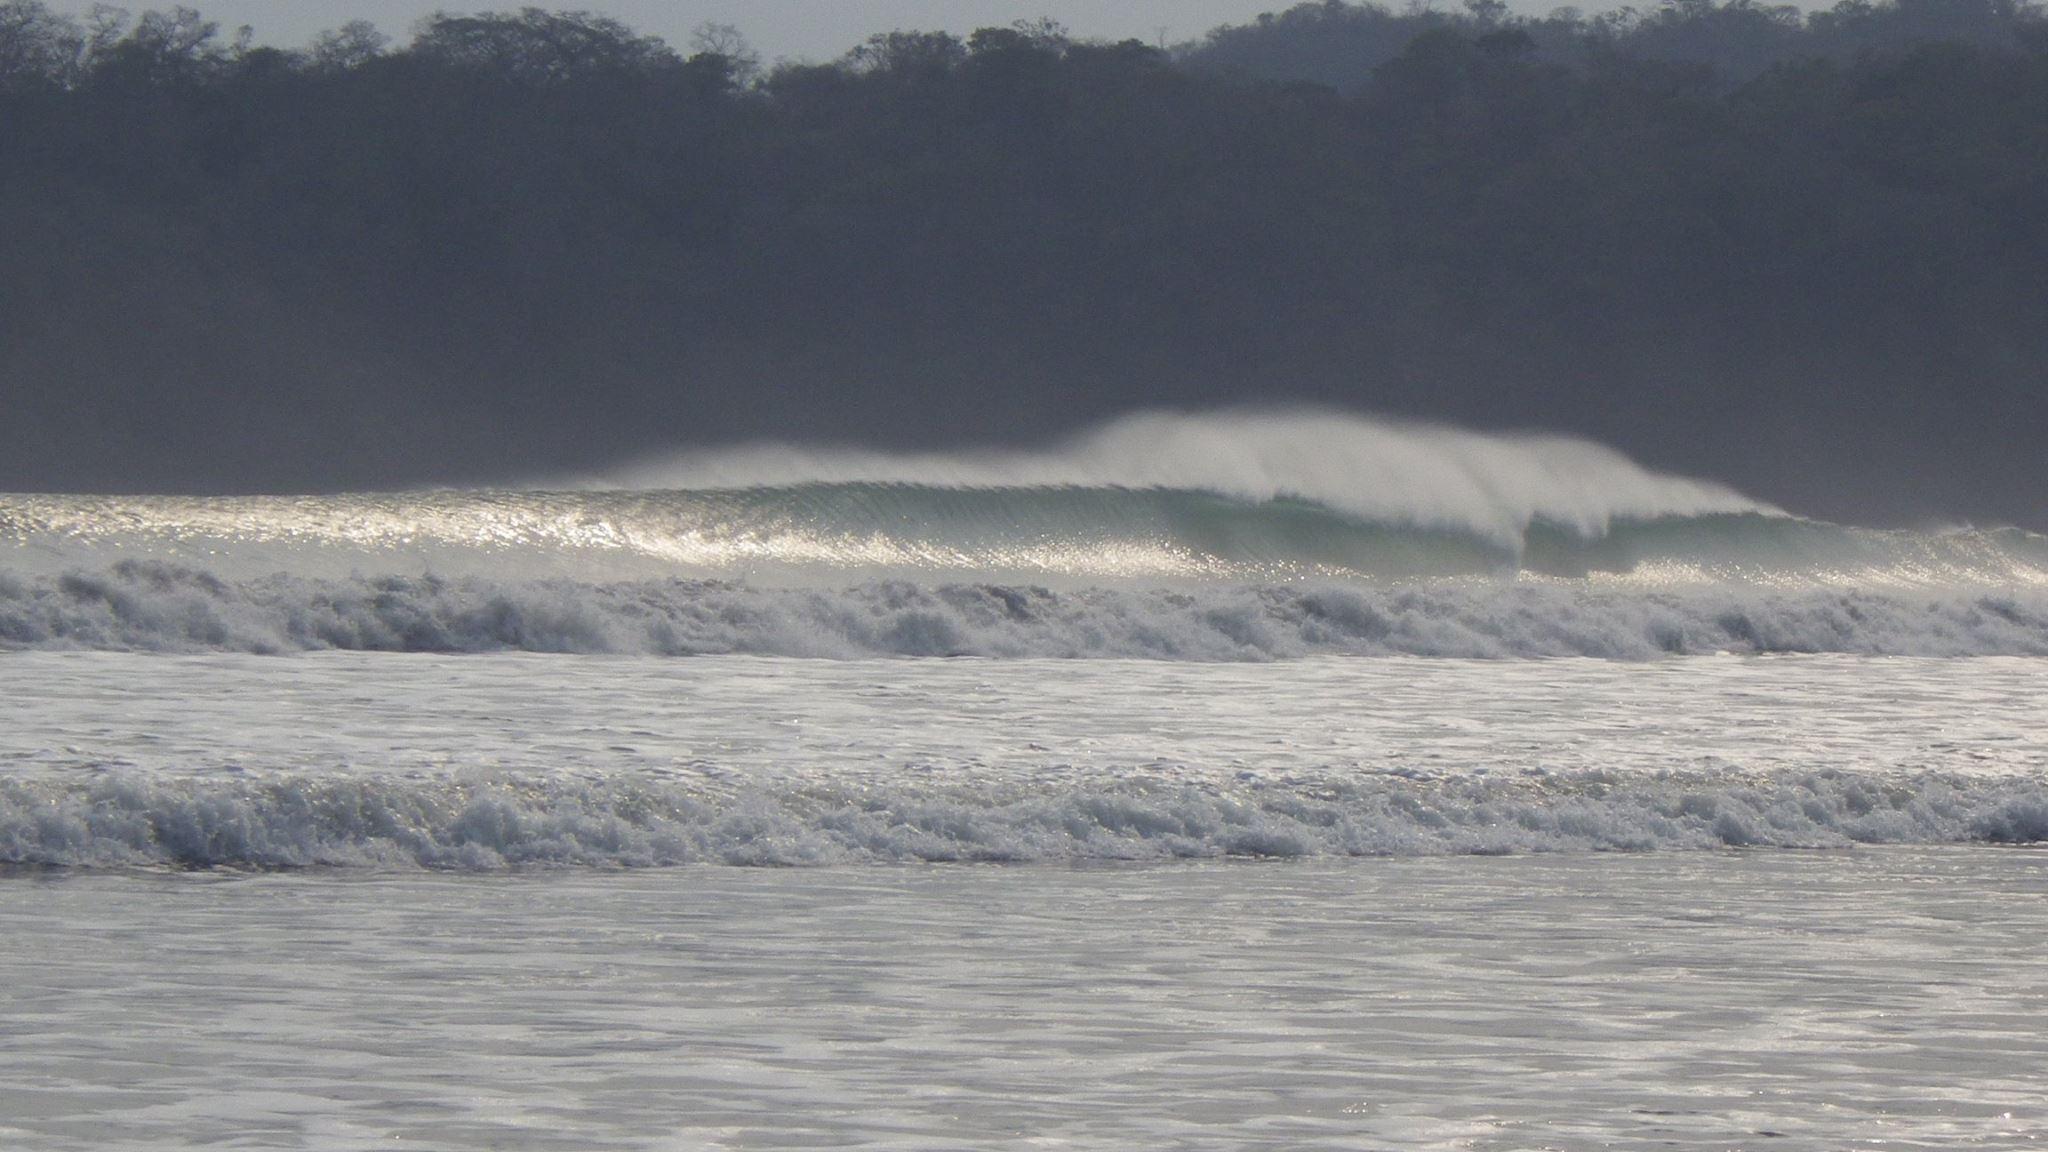 Rising swell